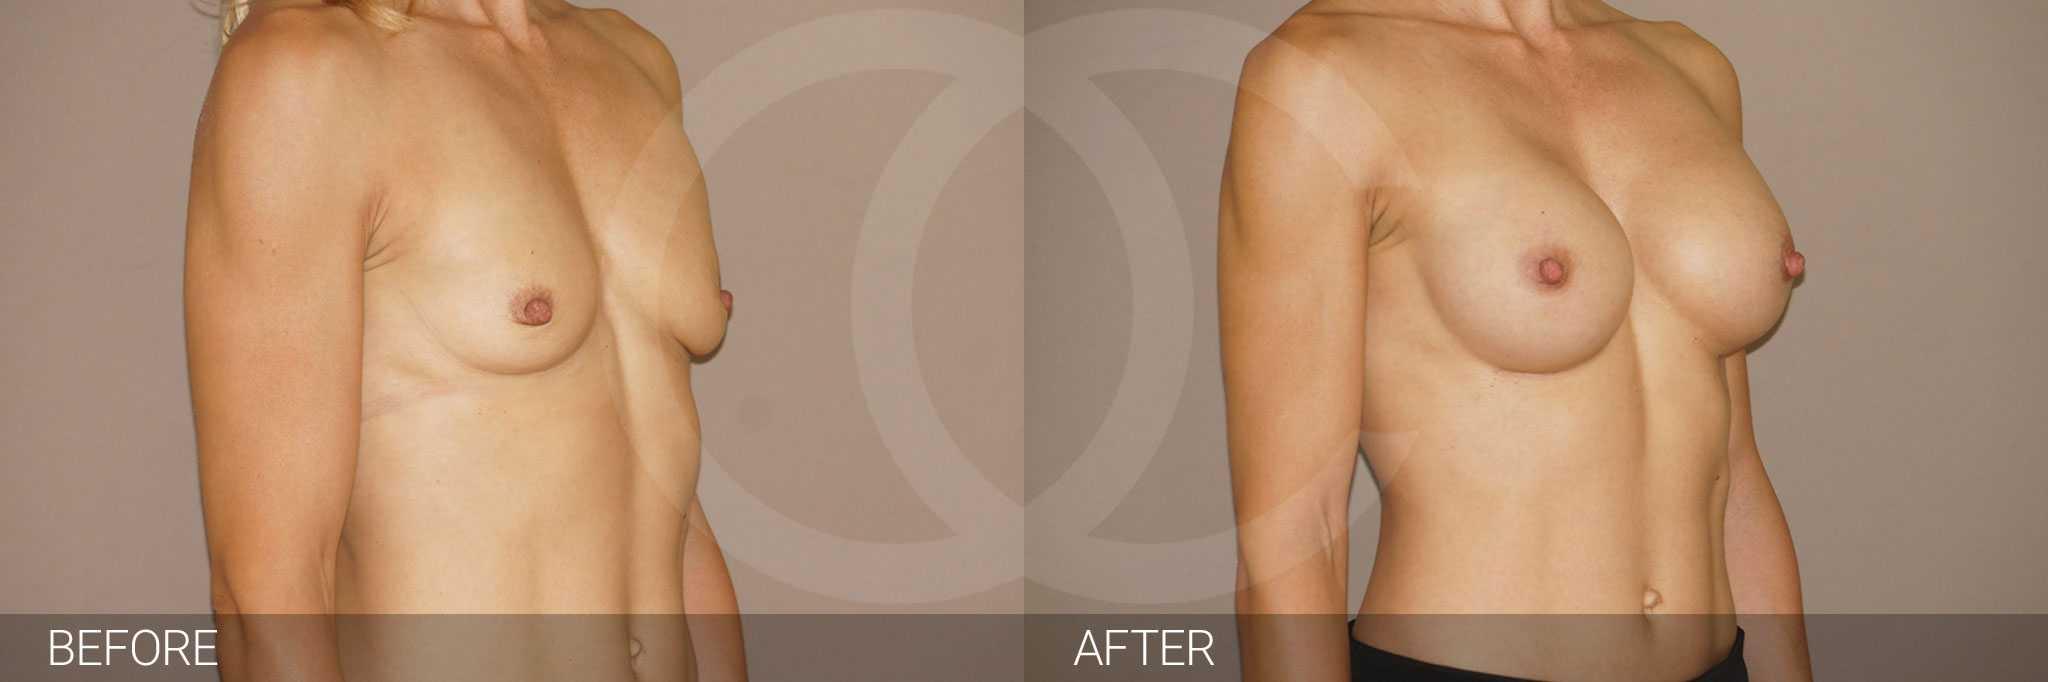 Augmentation mammaire Prothèses mammaires en silicone ante/post-op II